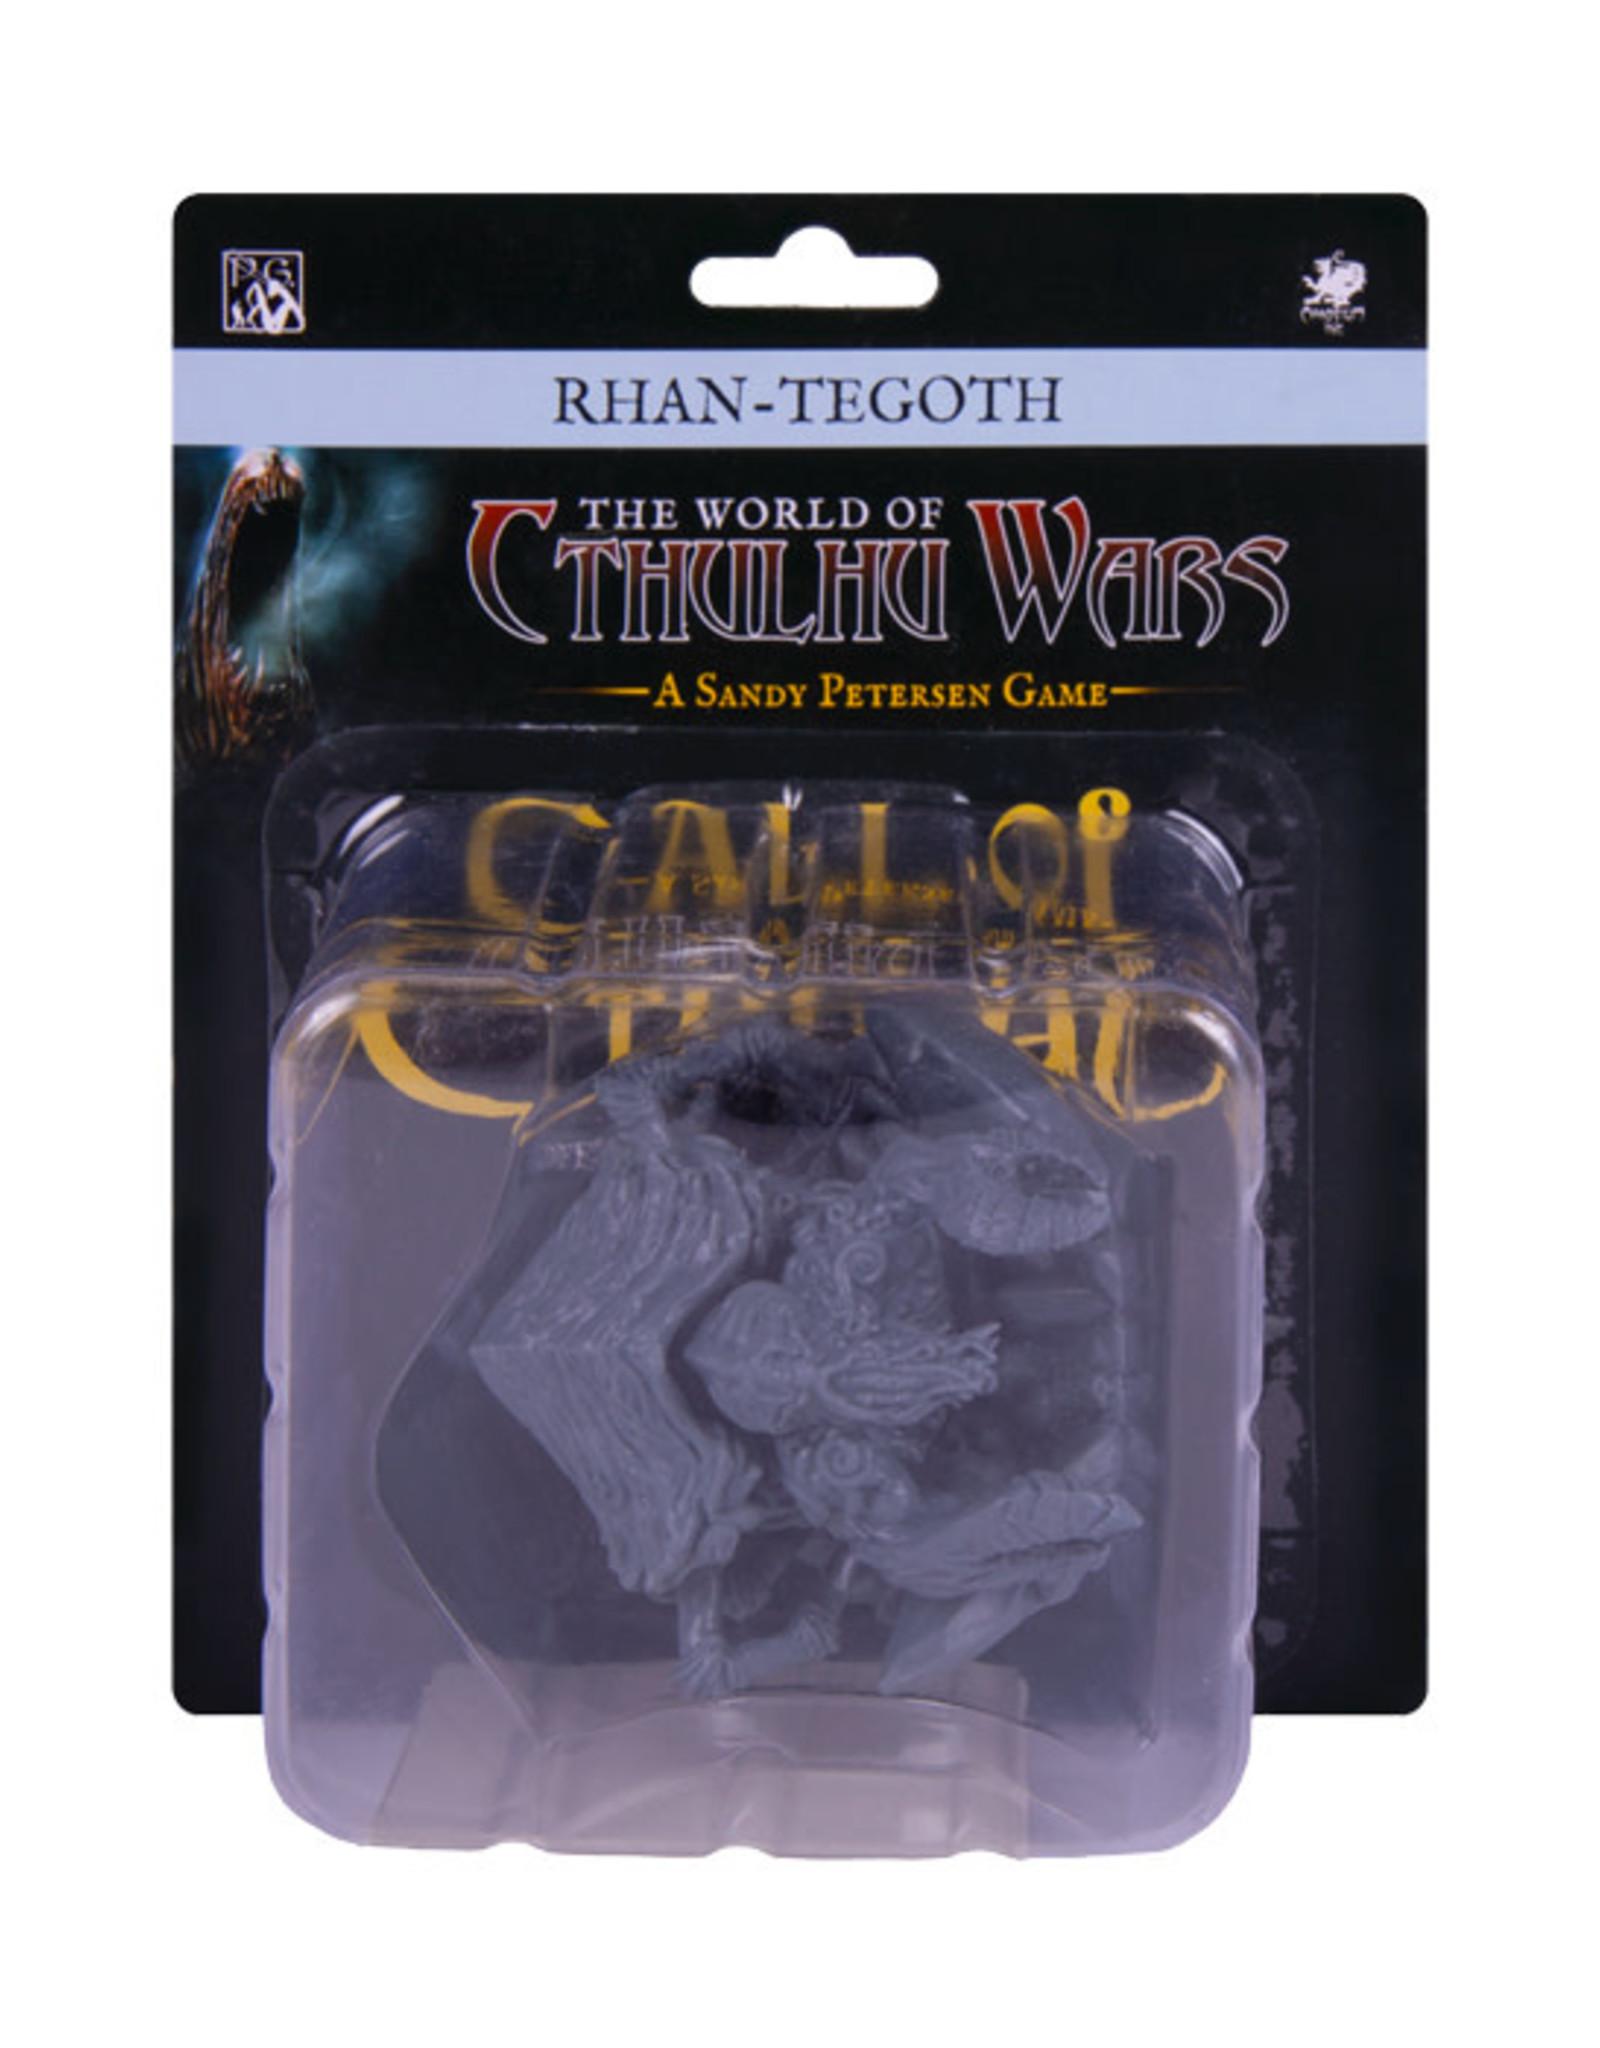 Call of Cthulhu: Miniature - Rhan-Tegoth